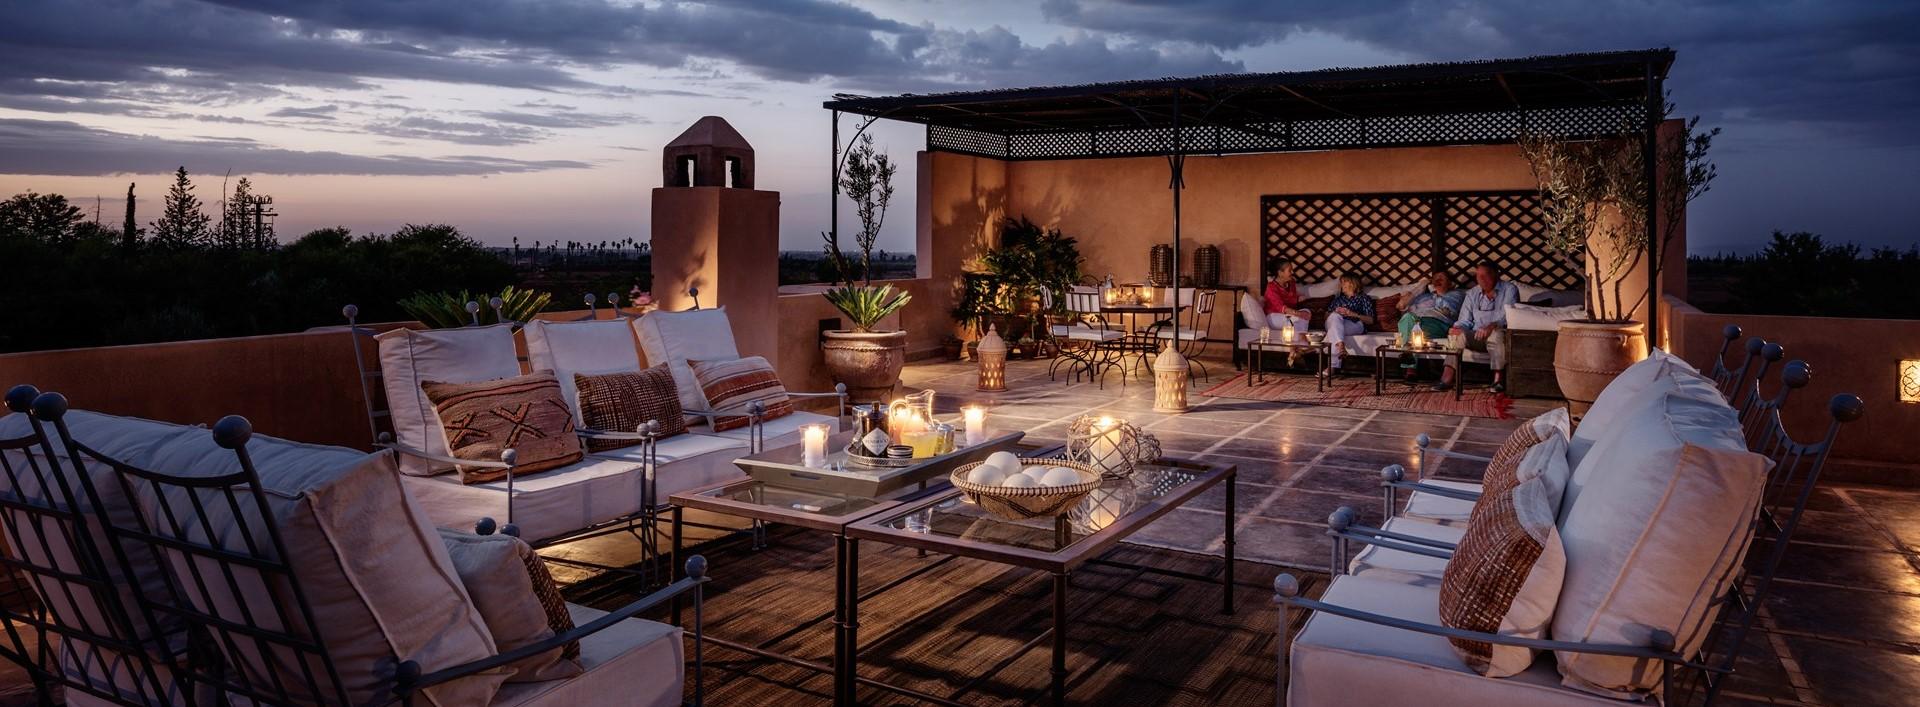 dar-yasmina-roof-terrace-night